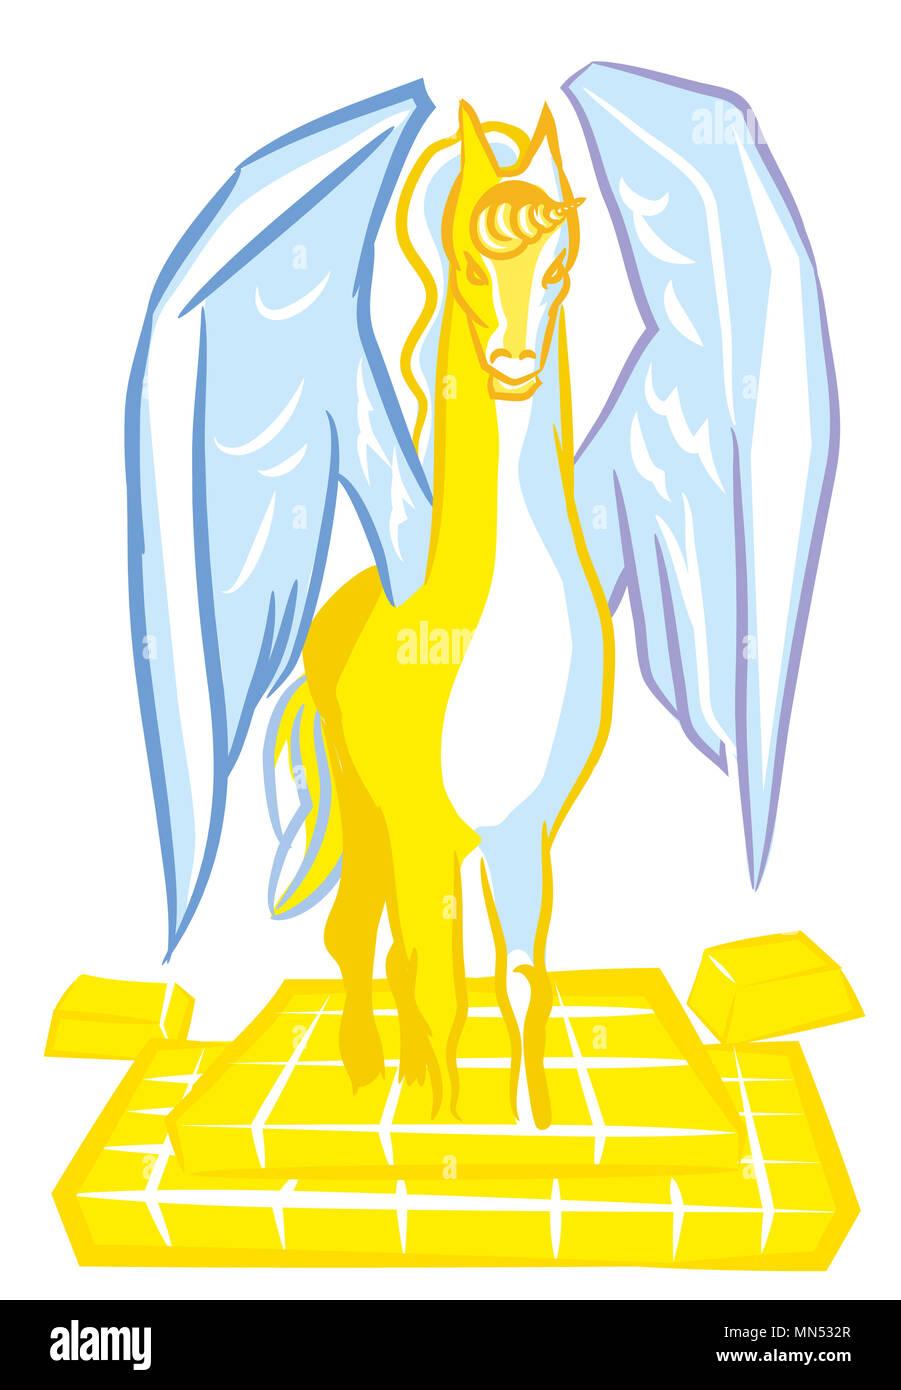 Unicorn startup with gold bullion.  Billion-dollar startups for business life. - Stock Image